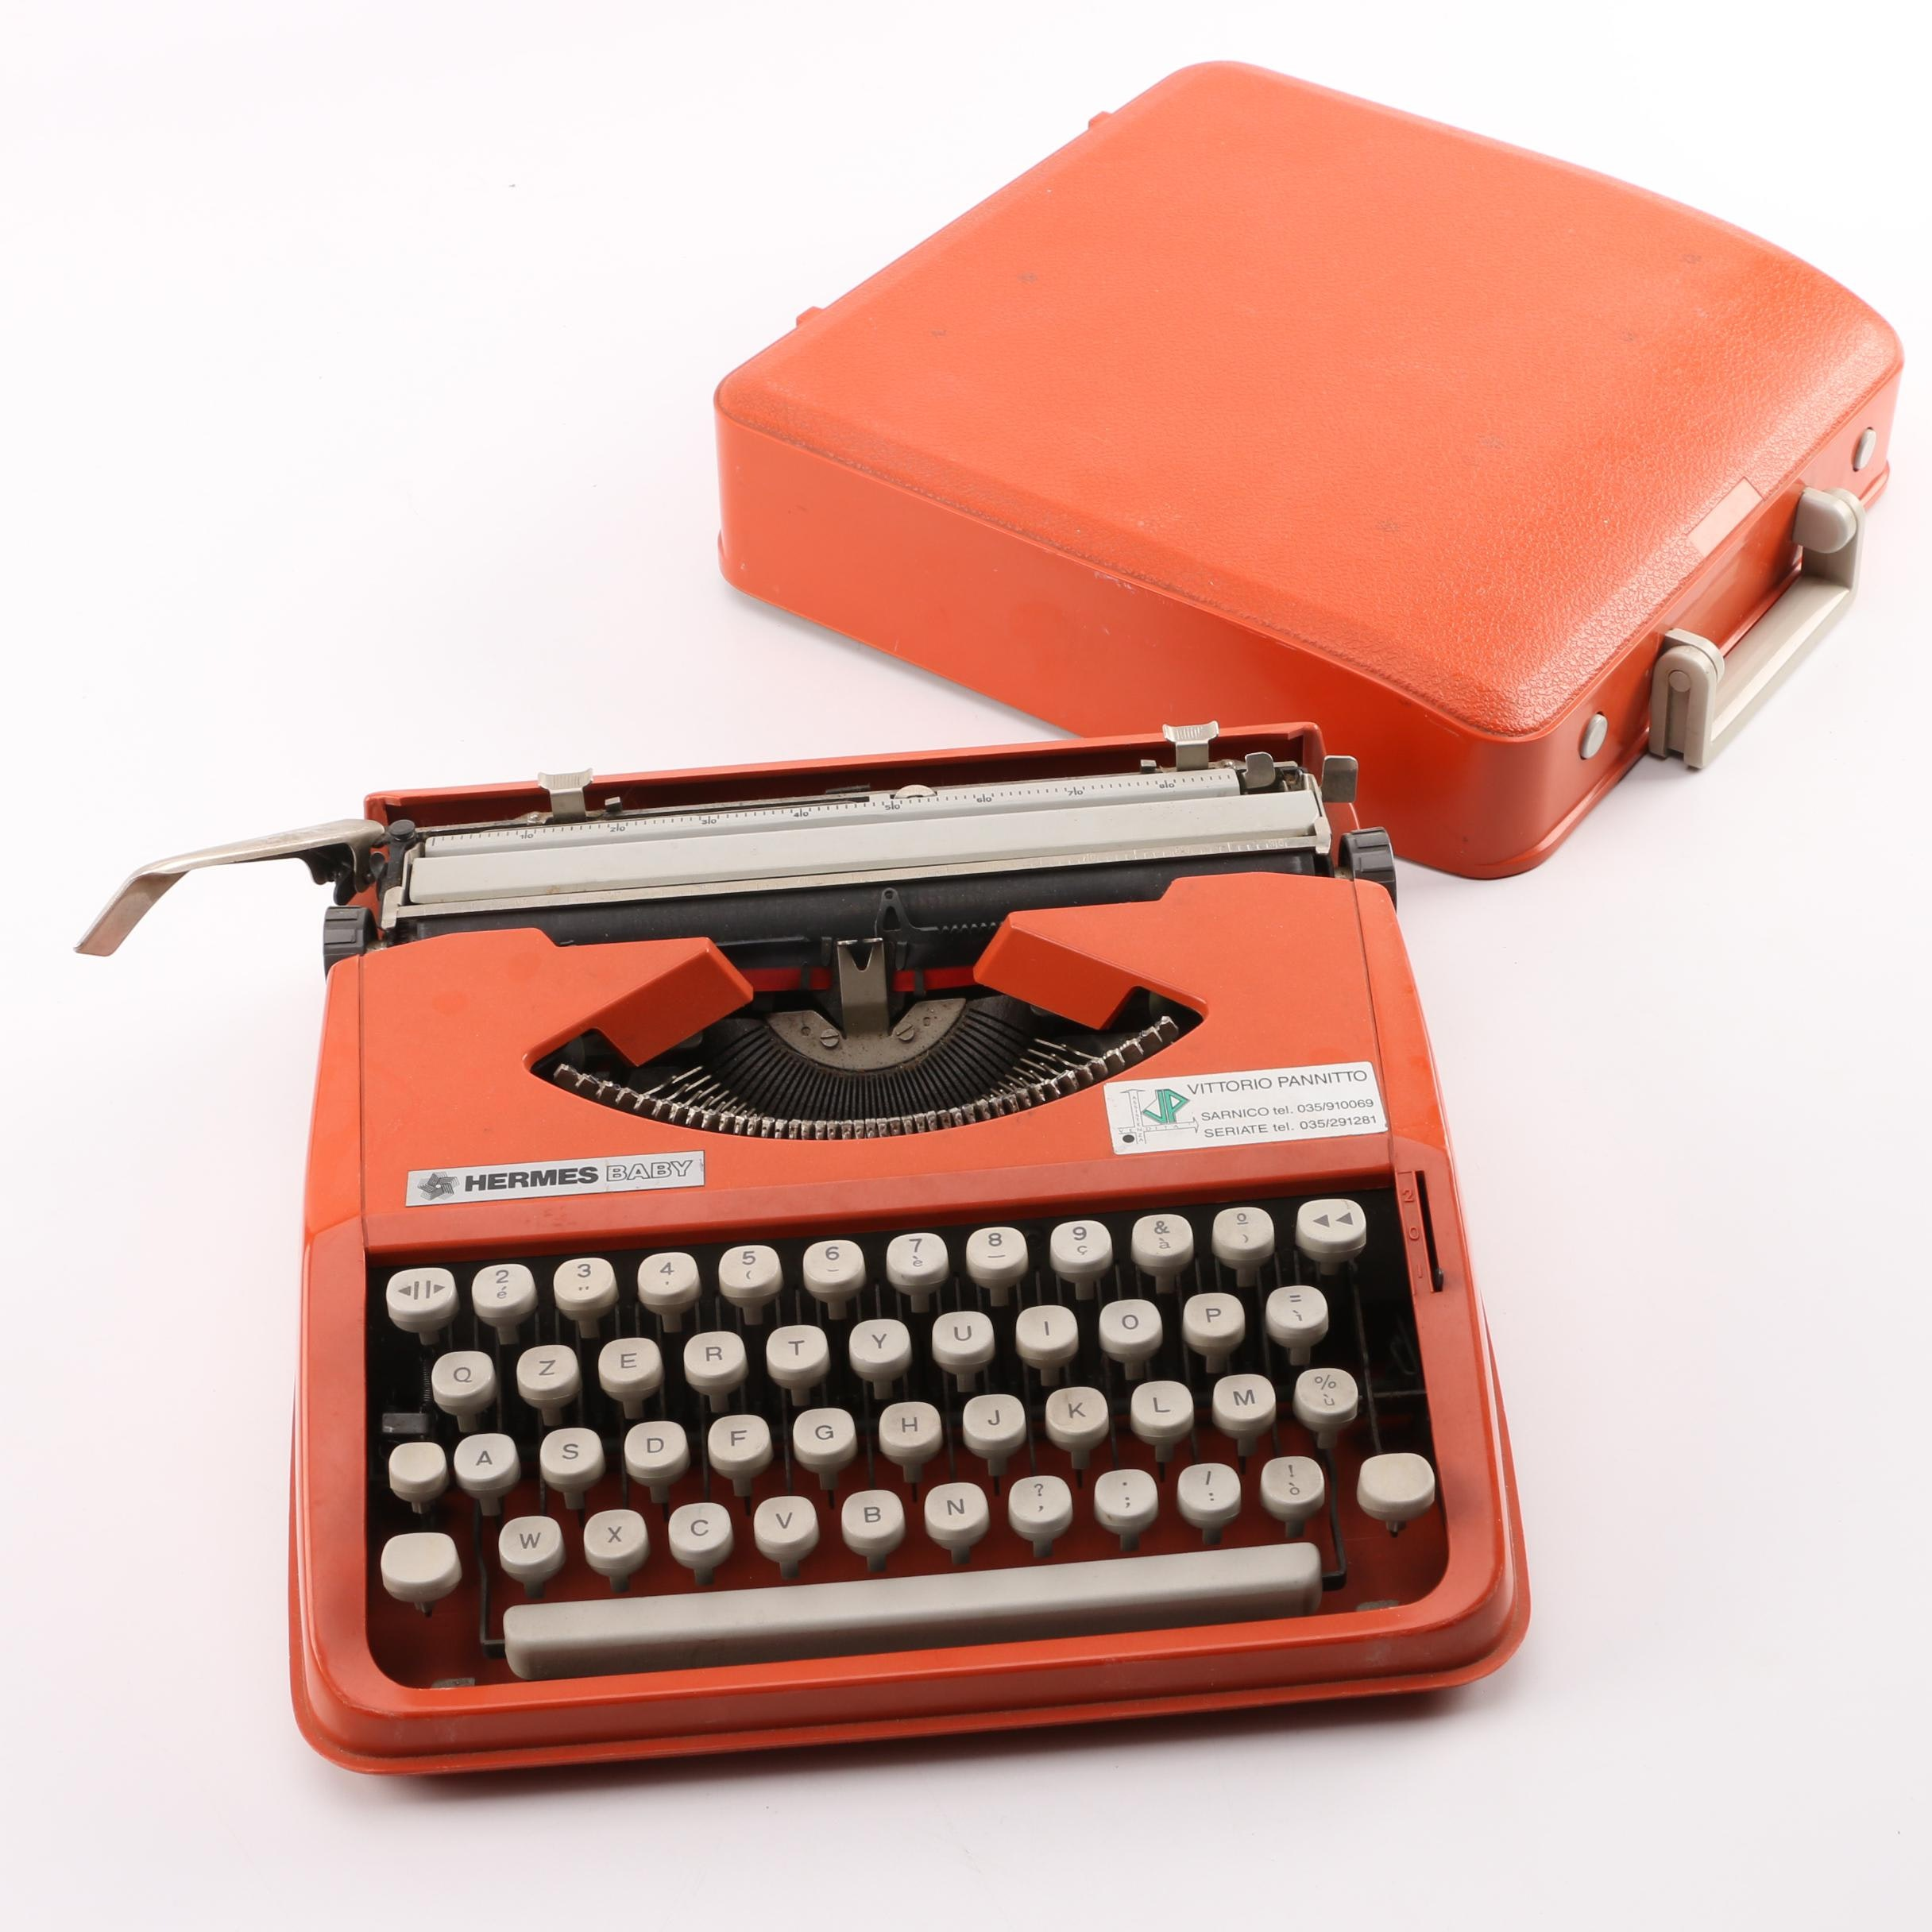 1960s-Era Hermes Baby Portable QZERTY Typewriter